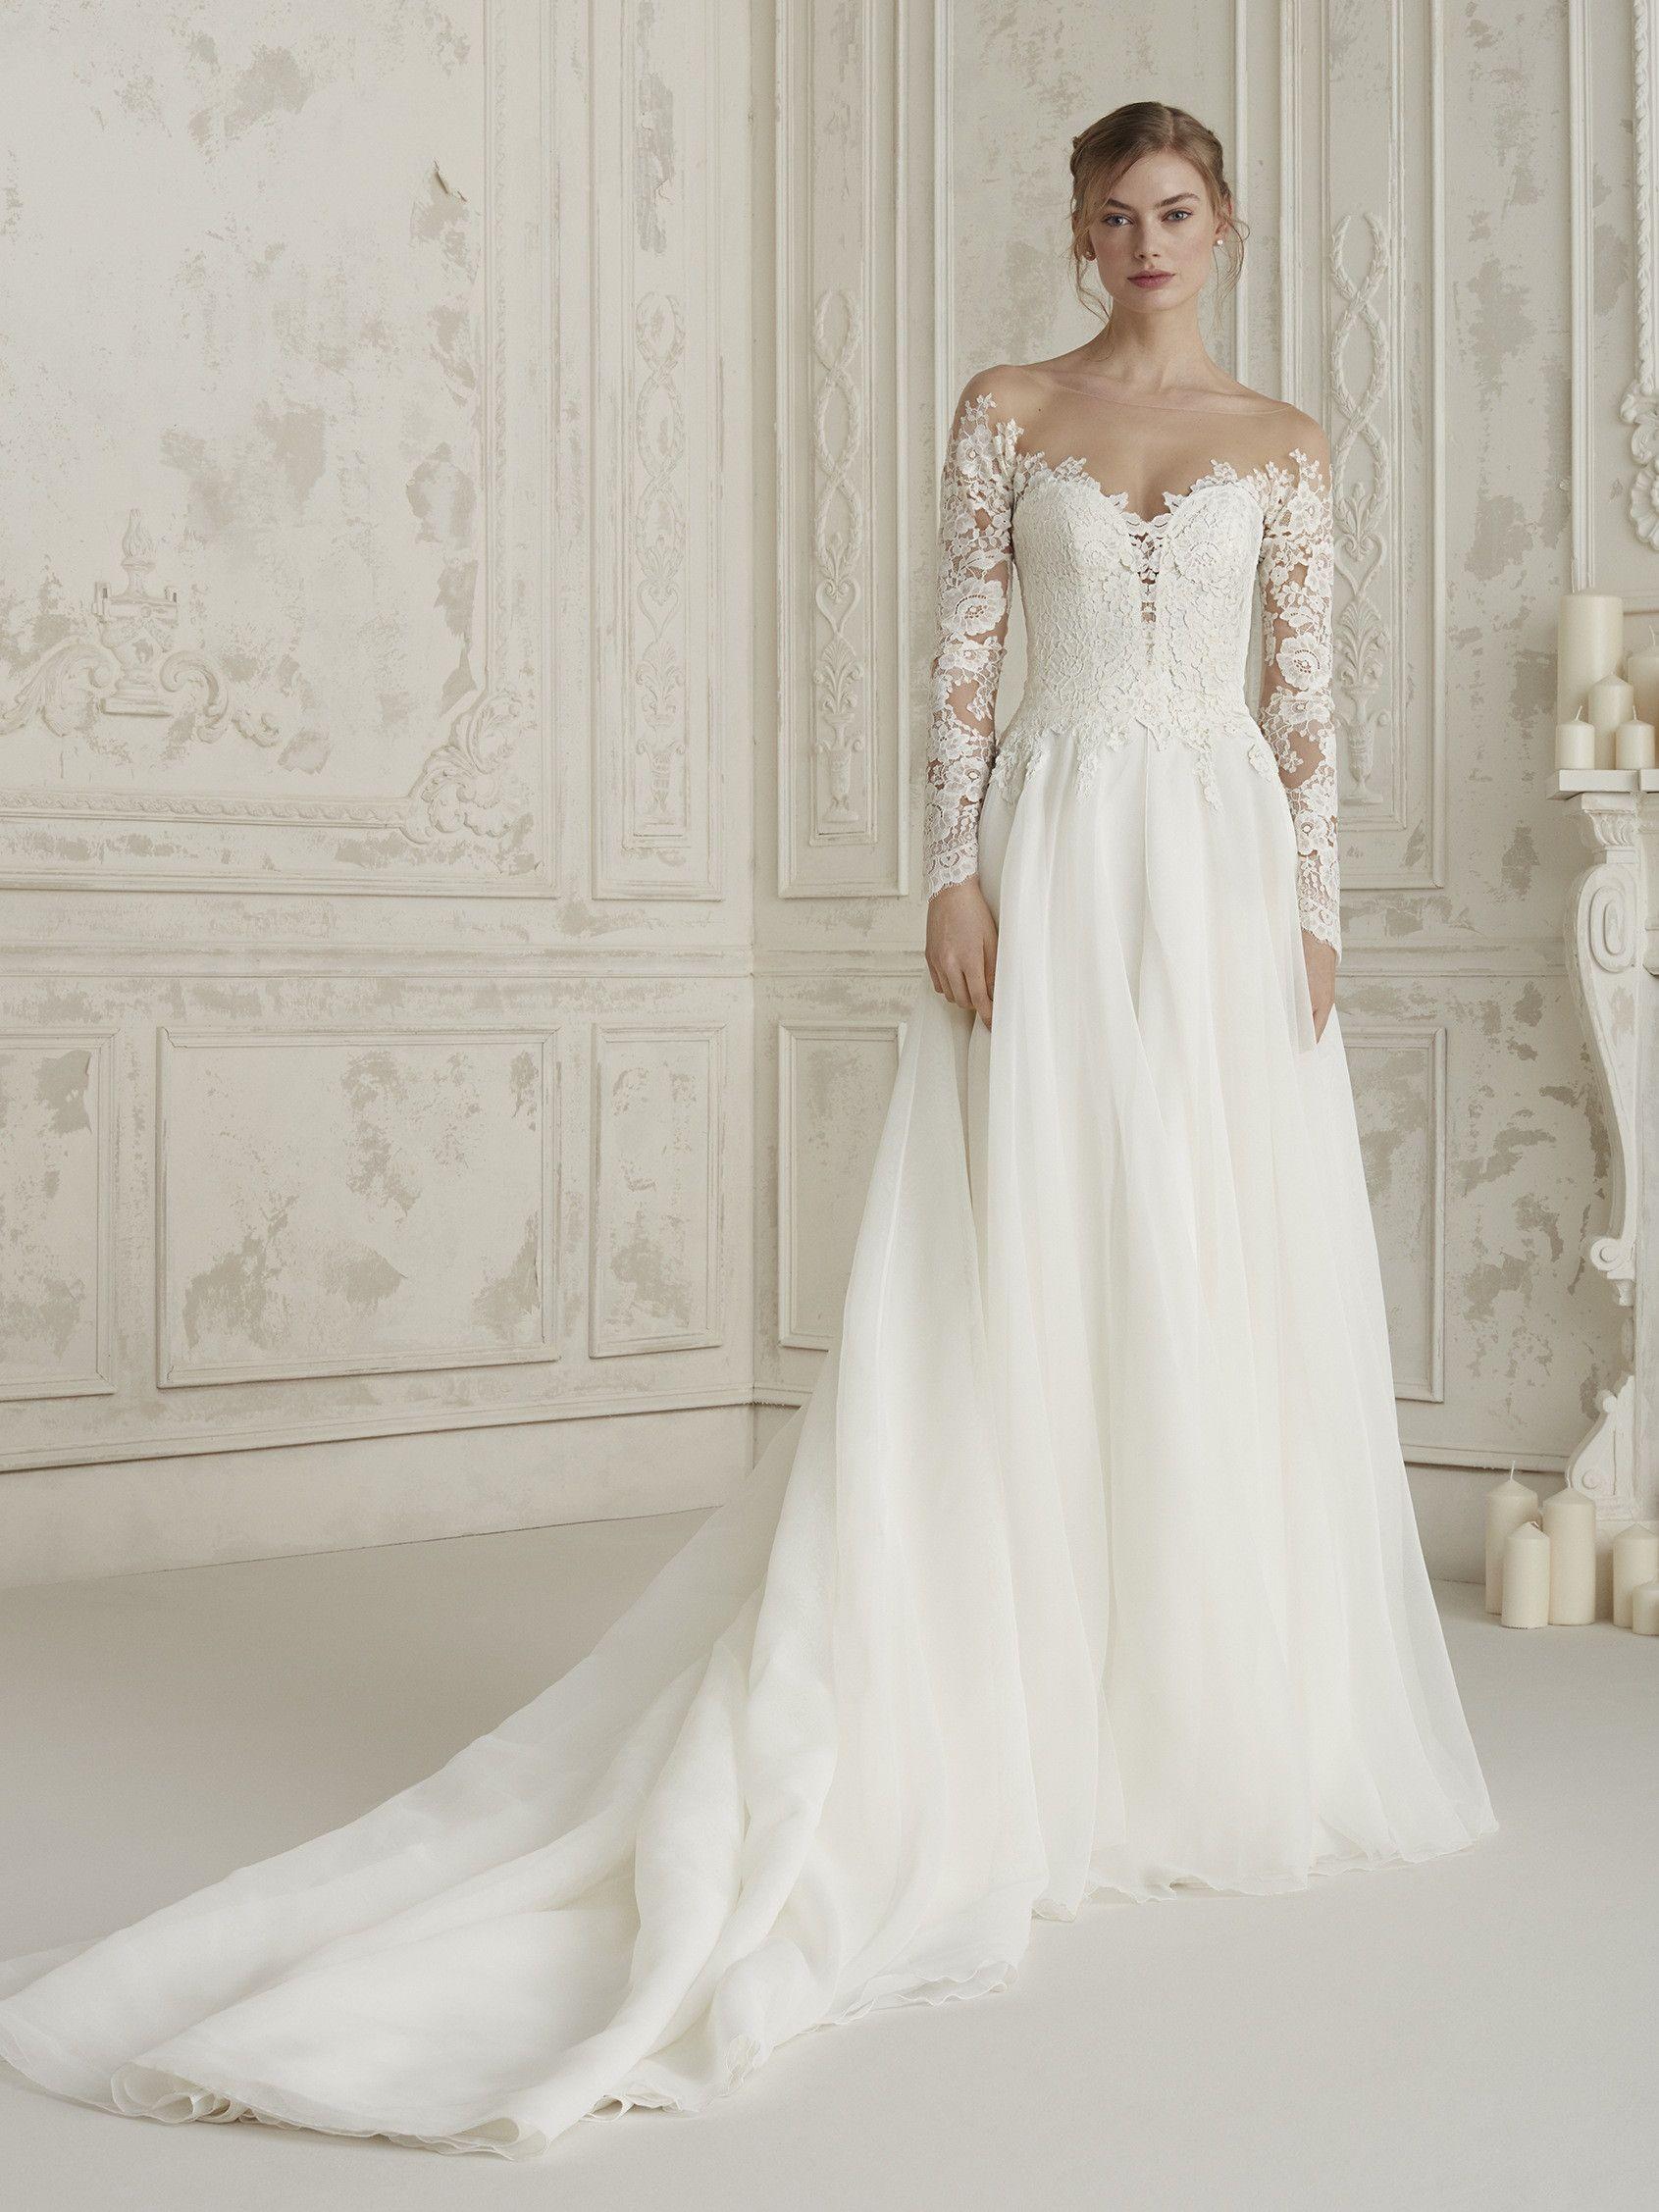 Evasé wedding dress with tattooeffect sleeves elisea pronovias